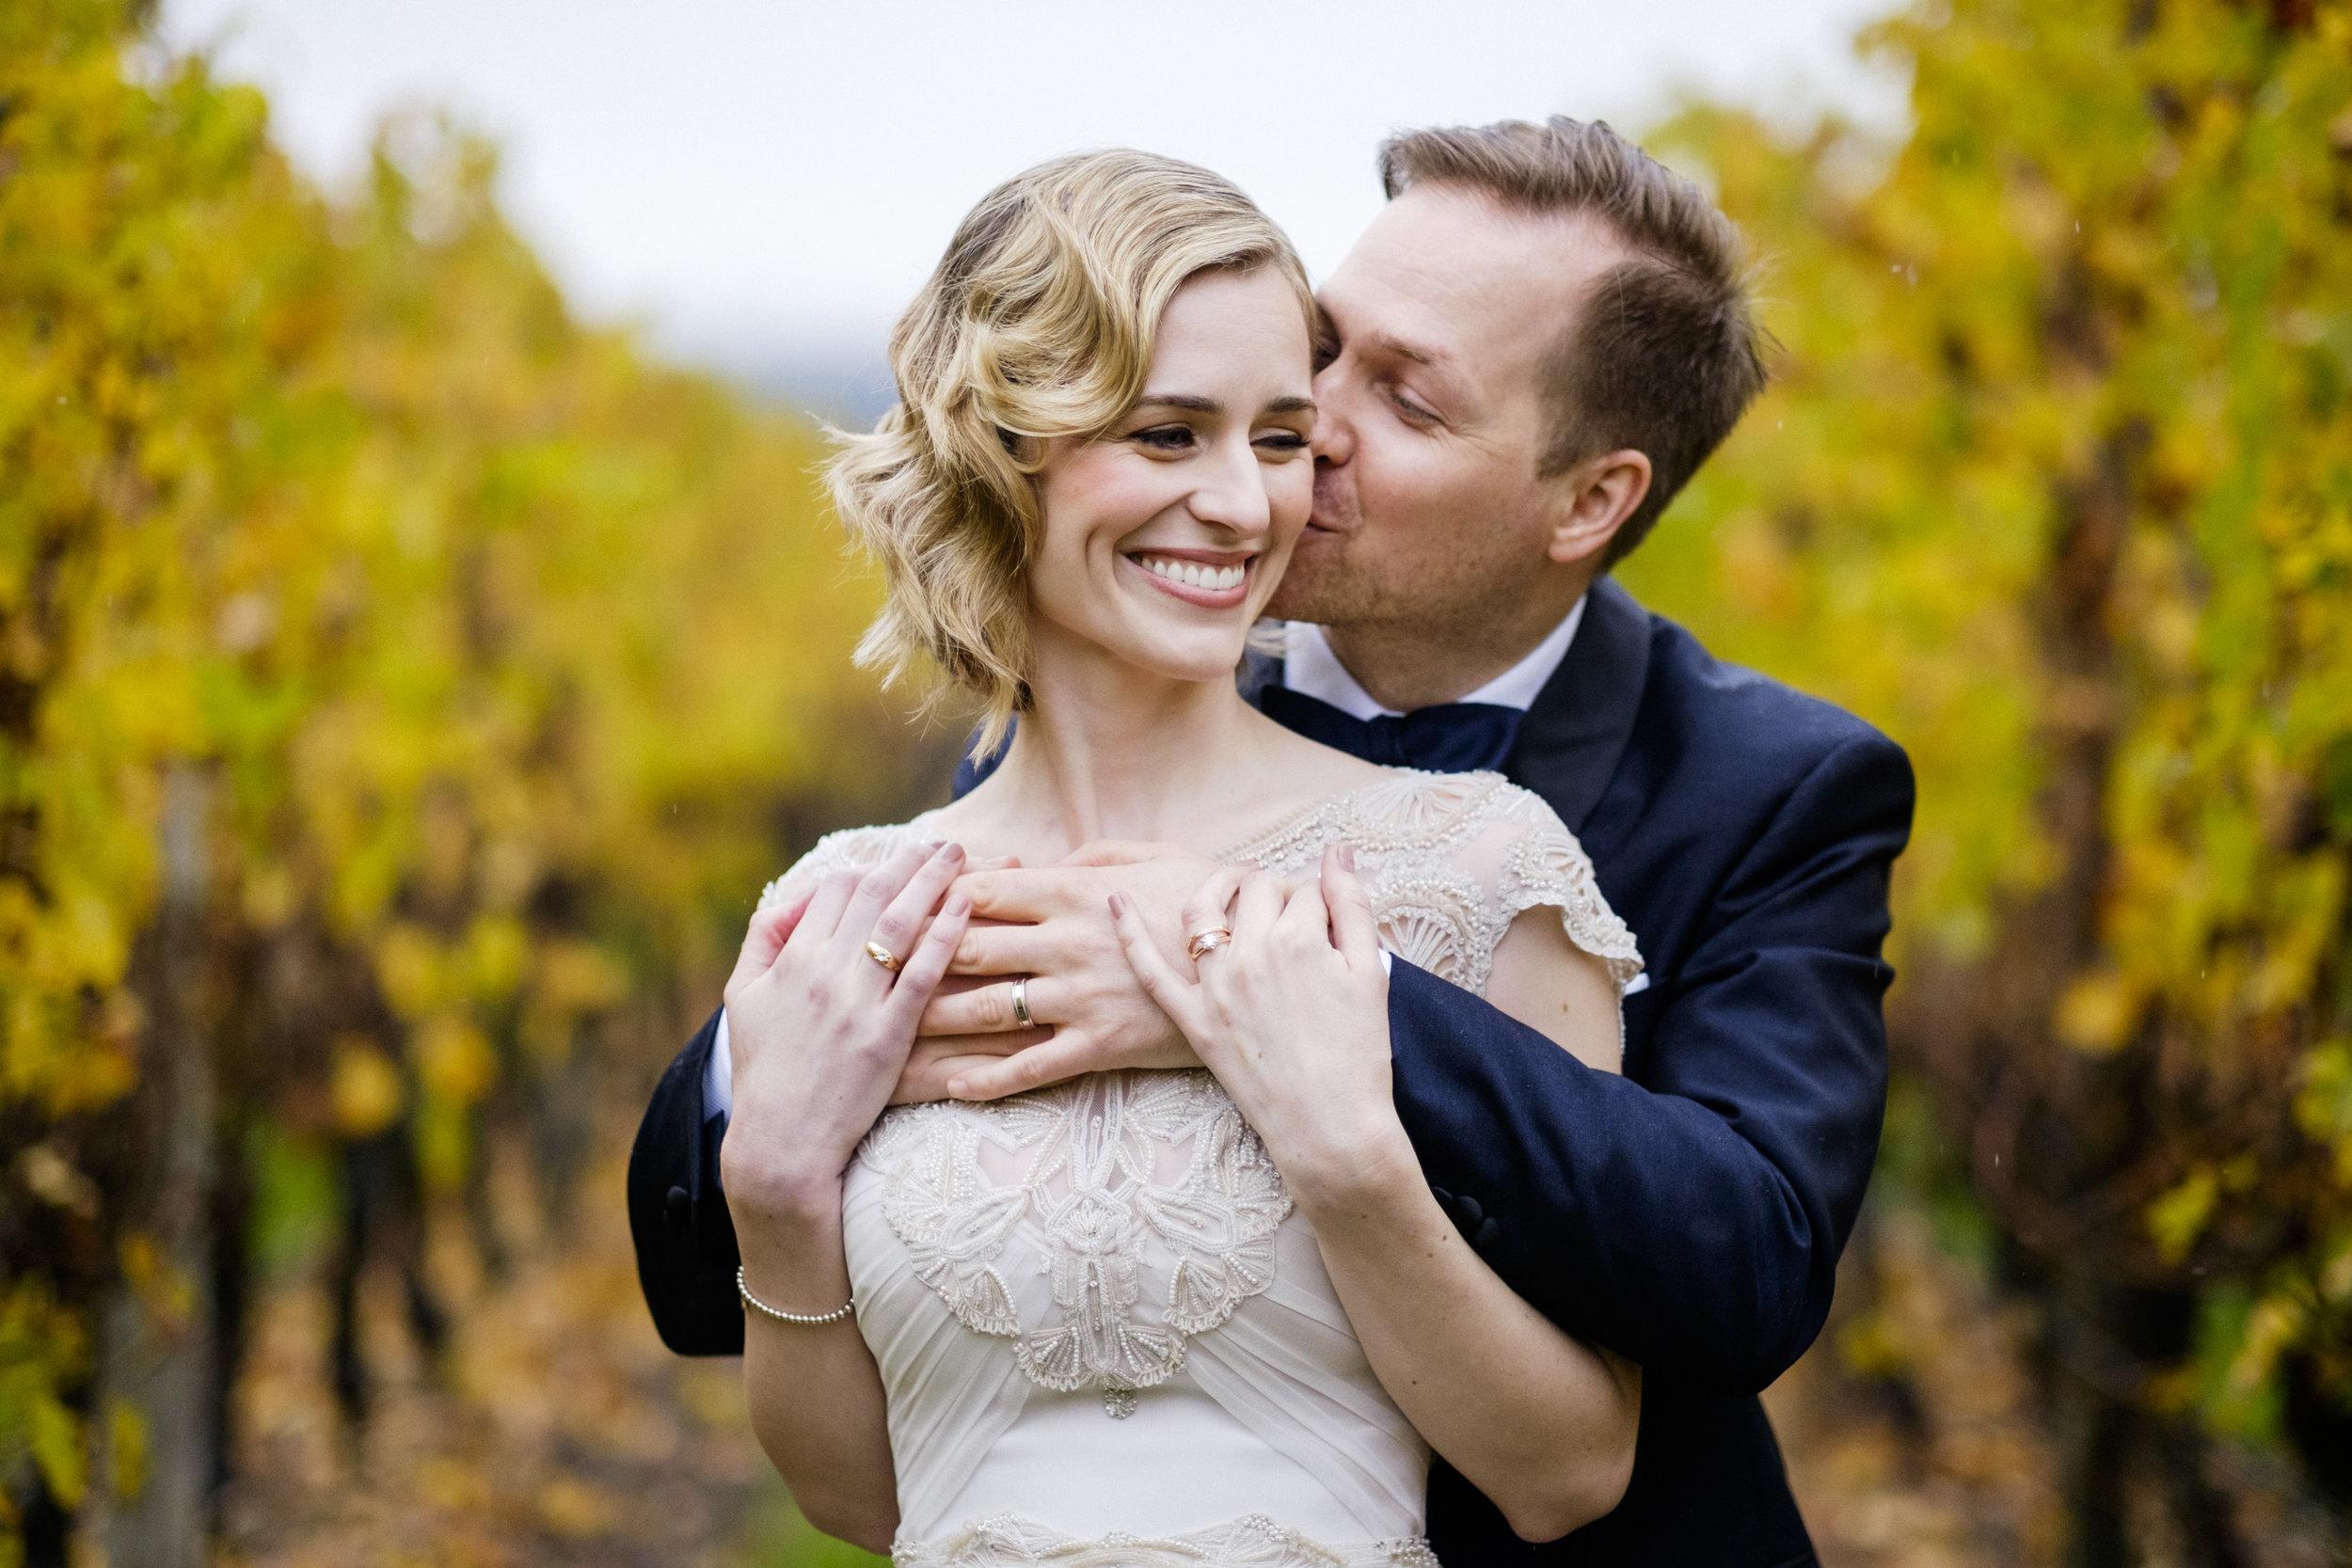 Courtney&Brendan_Wedding_HighRes_256.jpg